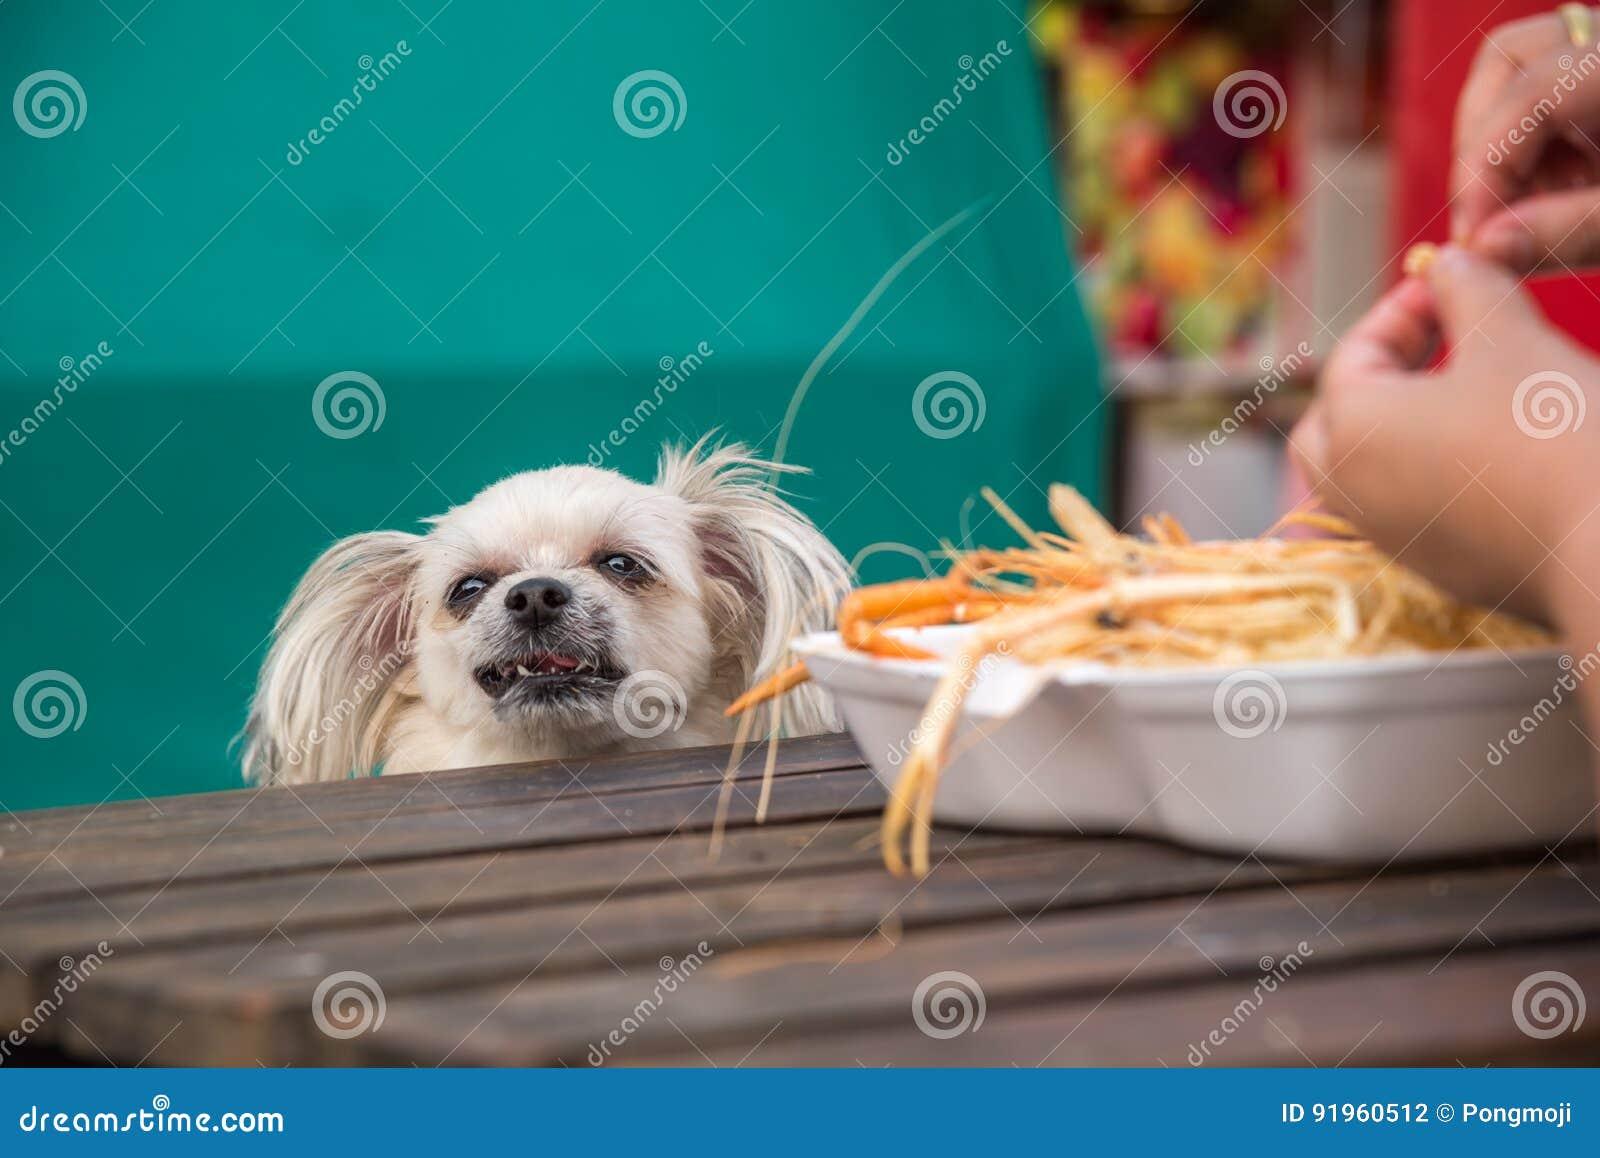 Dog Eat A Prawn Fried Shrimp Salt Feed Pet Owner Stock Photo Image